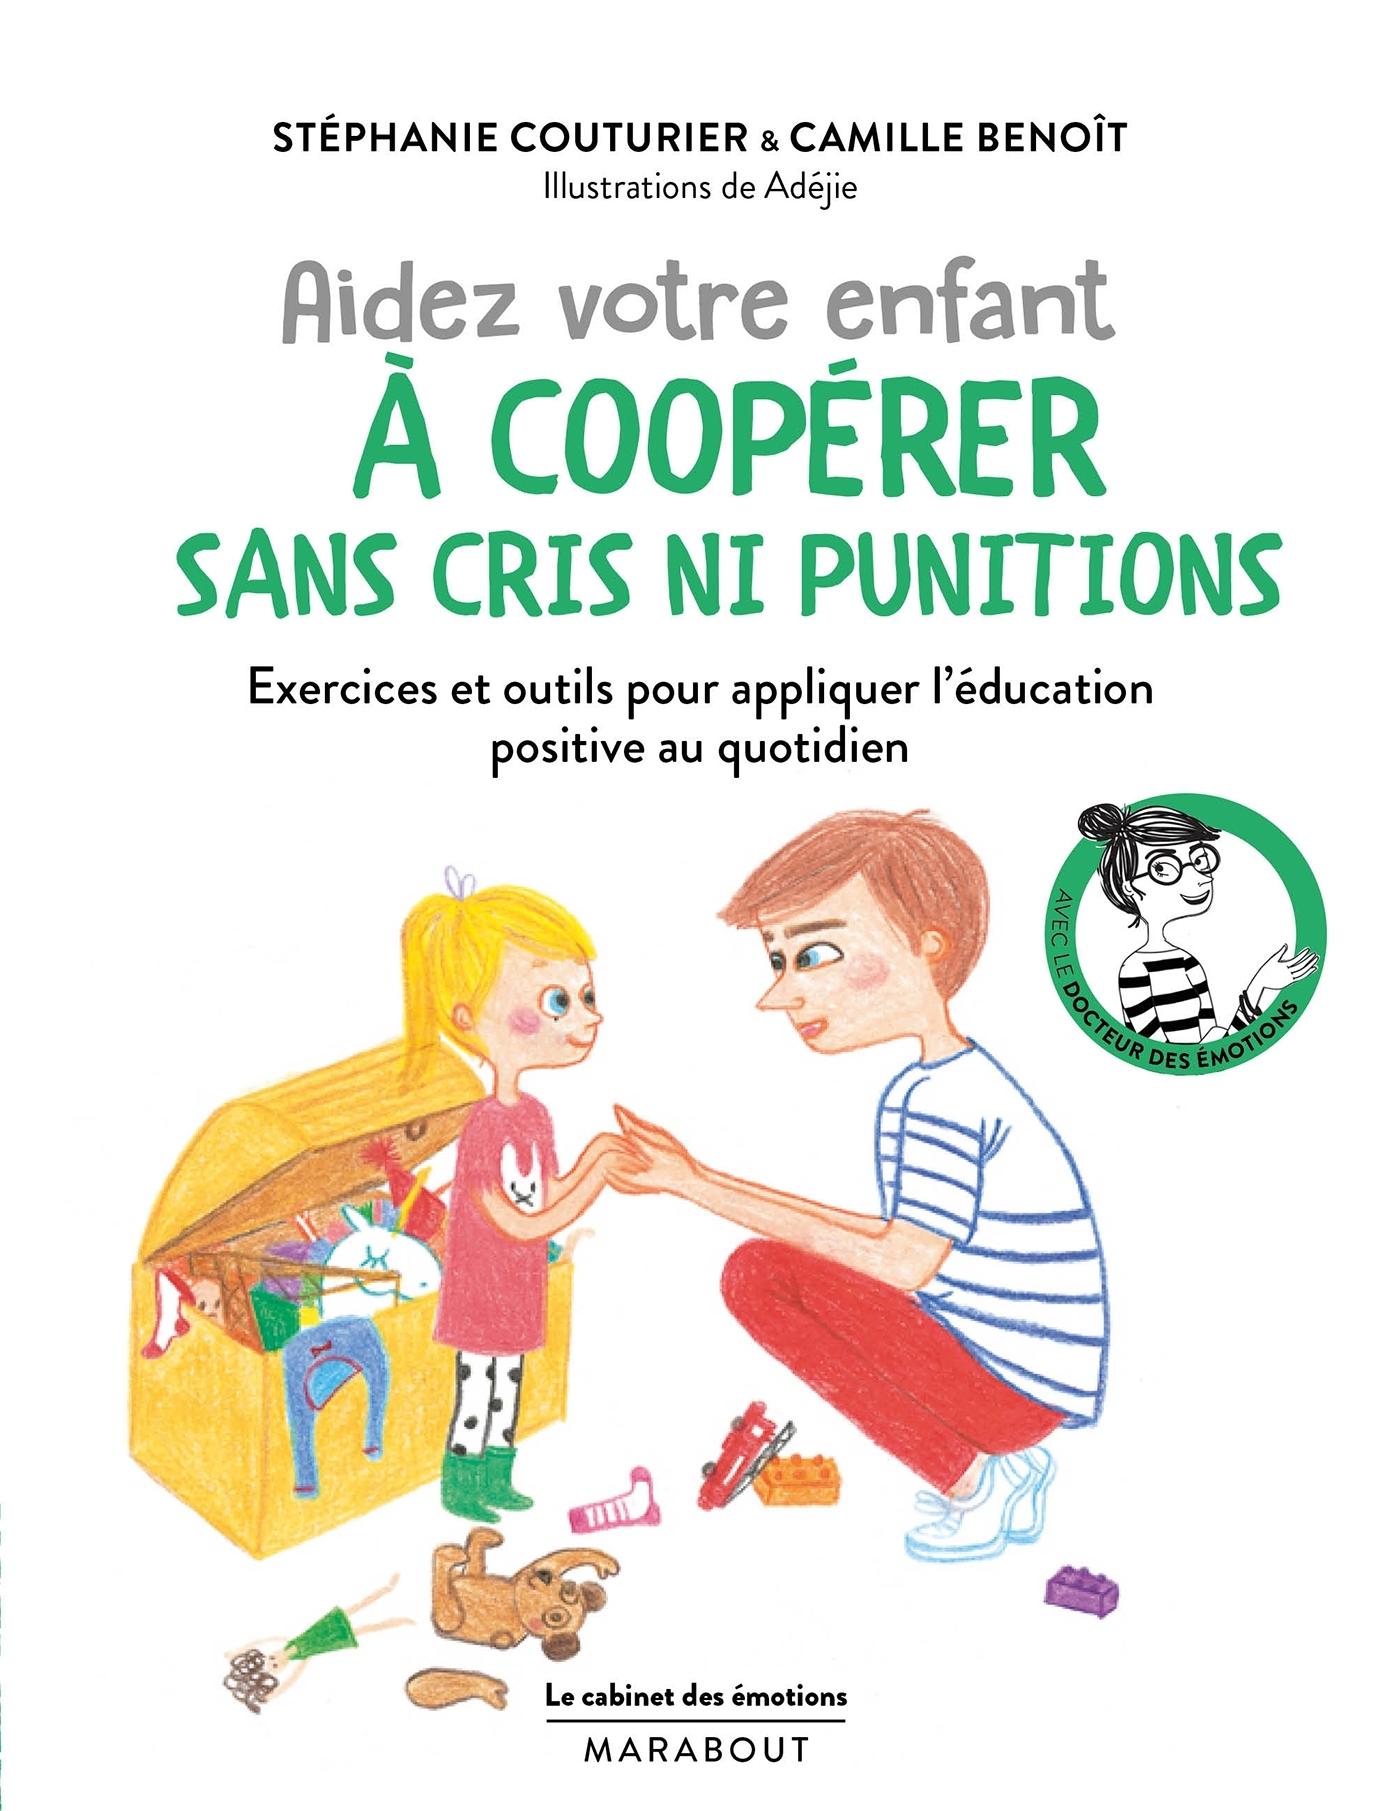 LE CABINET DES EMOTIONS AIDER VOTRE ENFANT A COOPERER